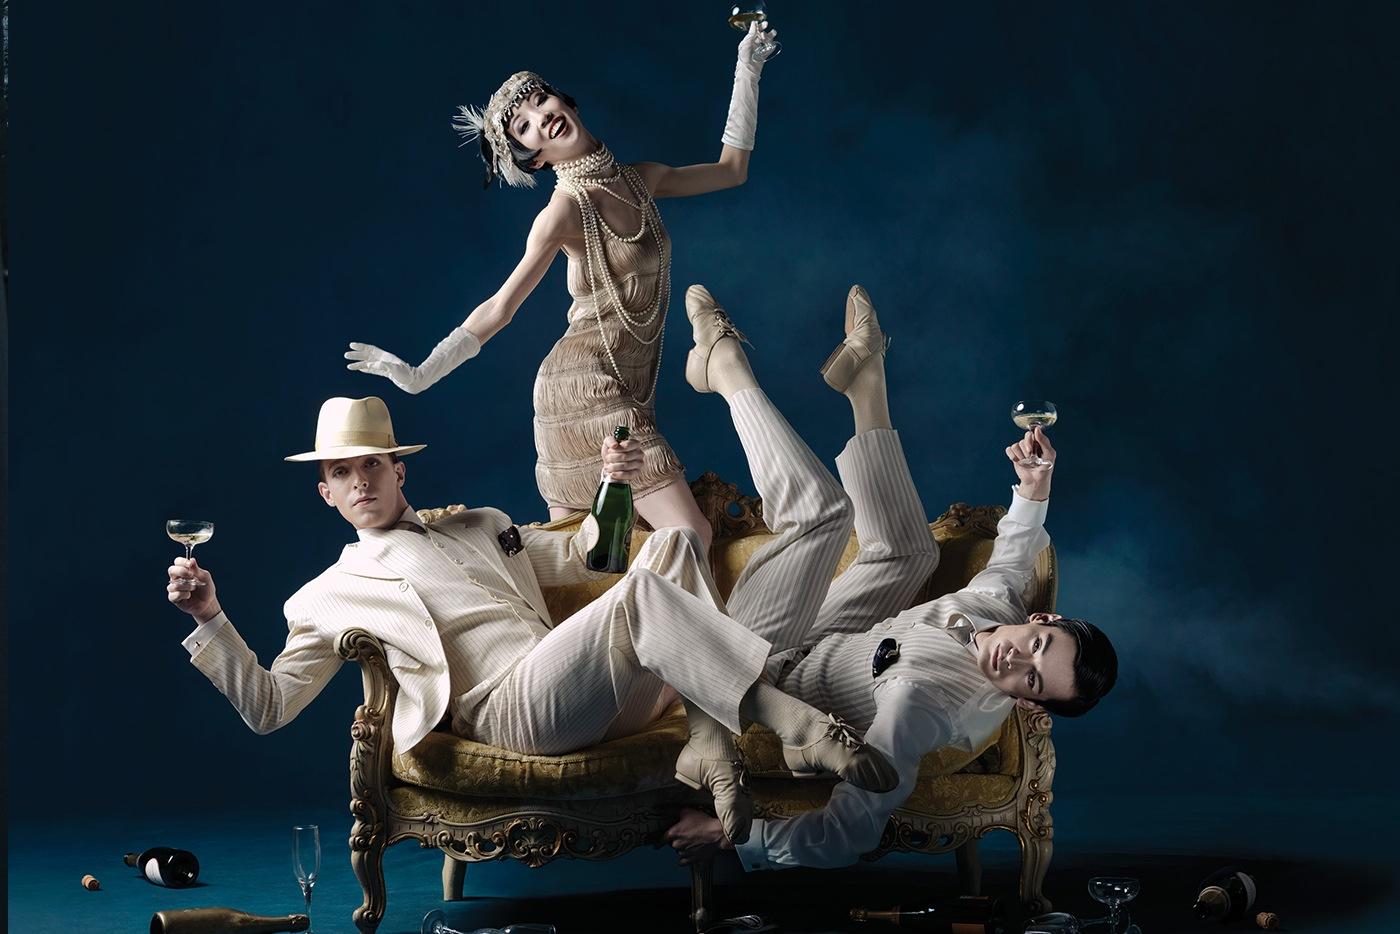 1400_933_Hong_Kong_Ballet_5_Tim_Yip_Septime_Webre_The_Great_Gatsby_Zolima_ZityMag